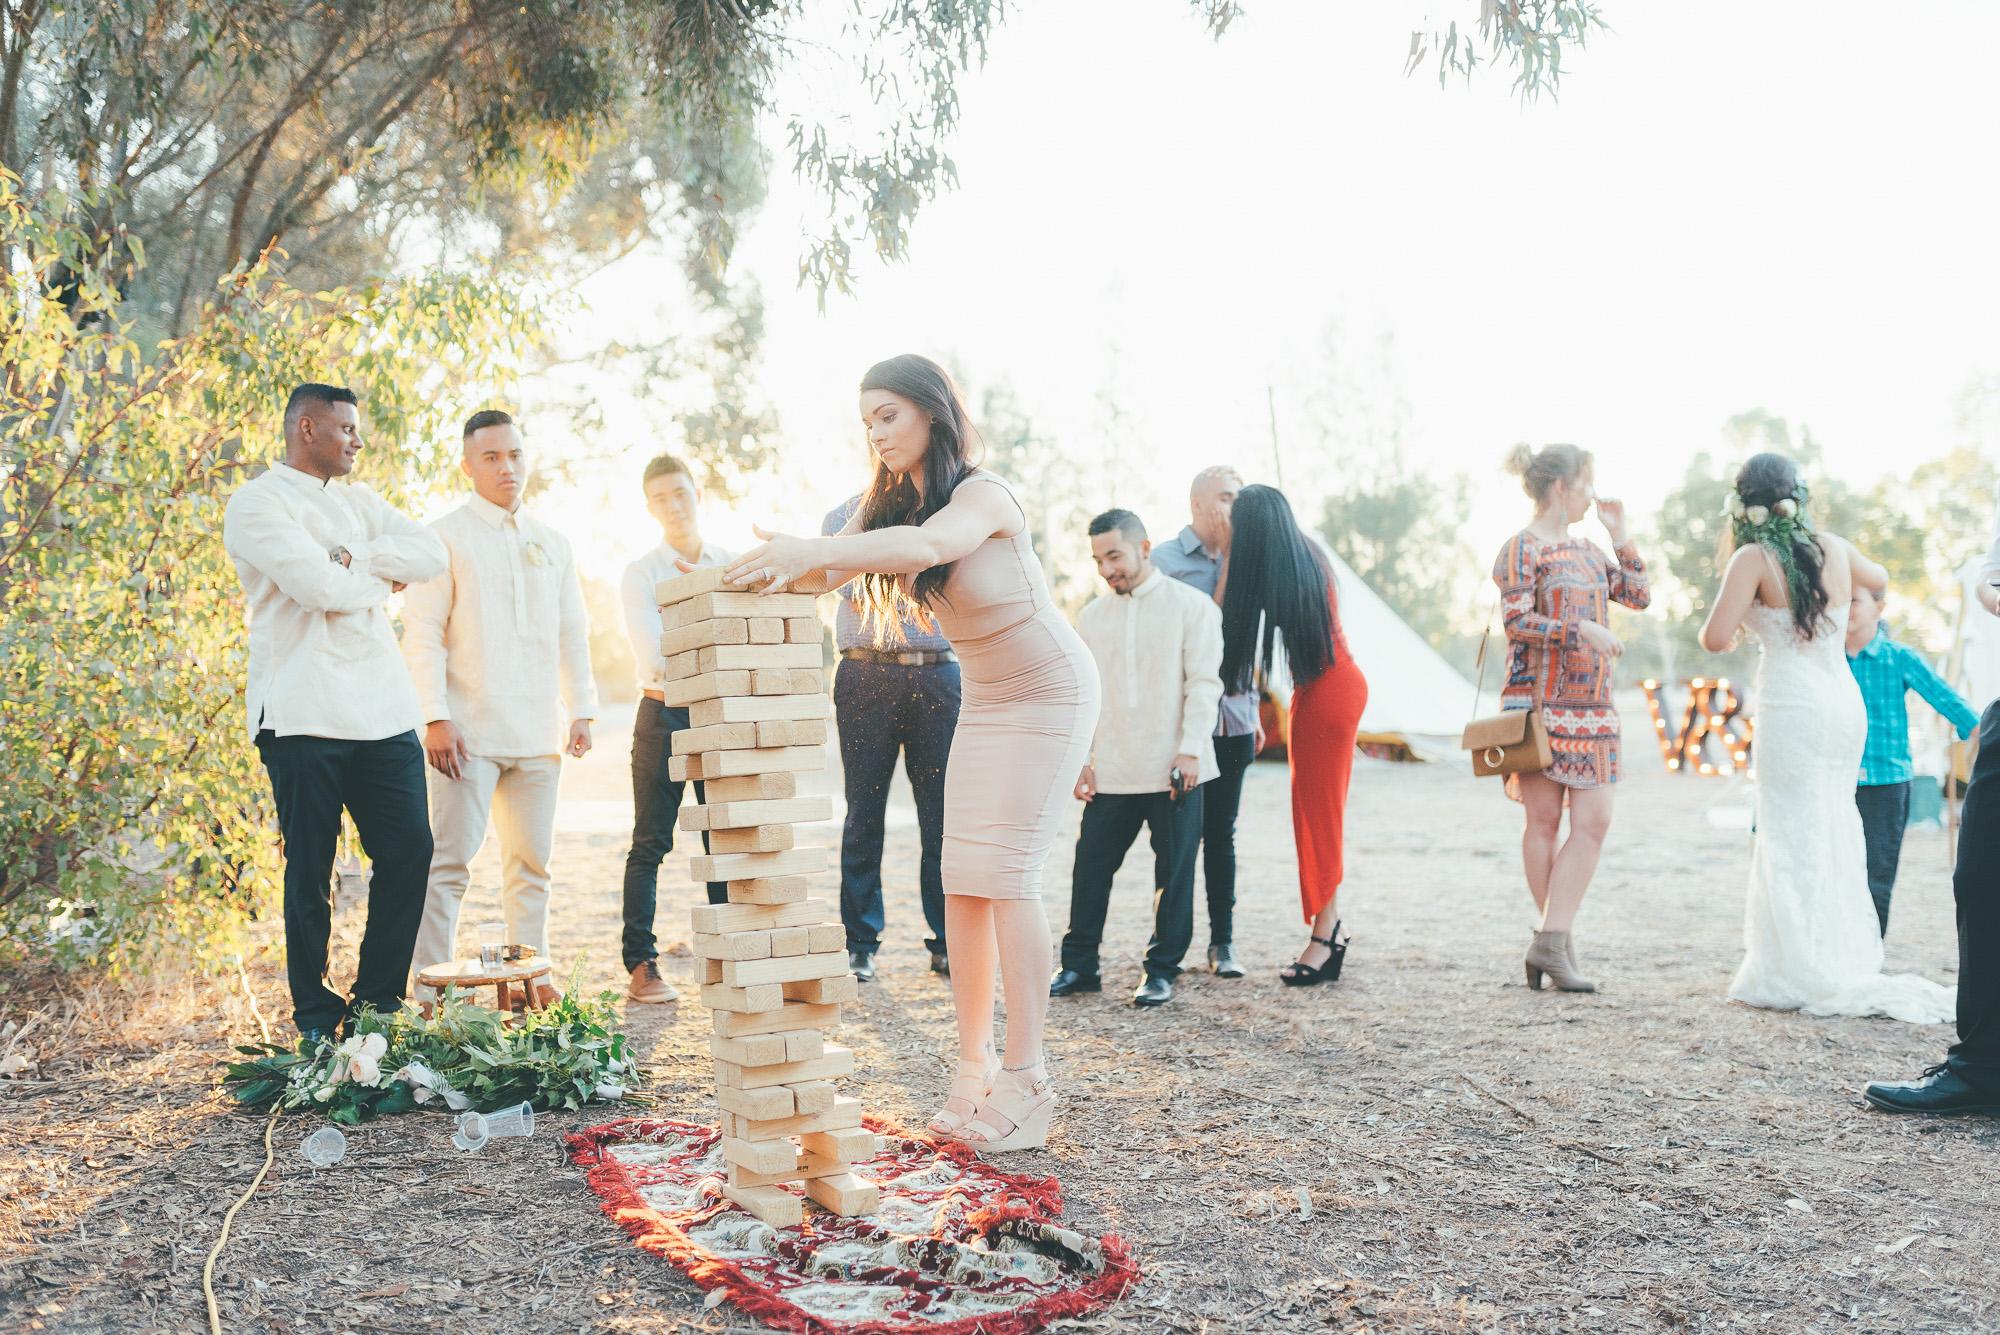 wedding-photographer-outdoor-casual-styled-los-angeles-australia-california-international-earthbound -71.jpg